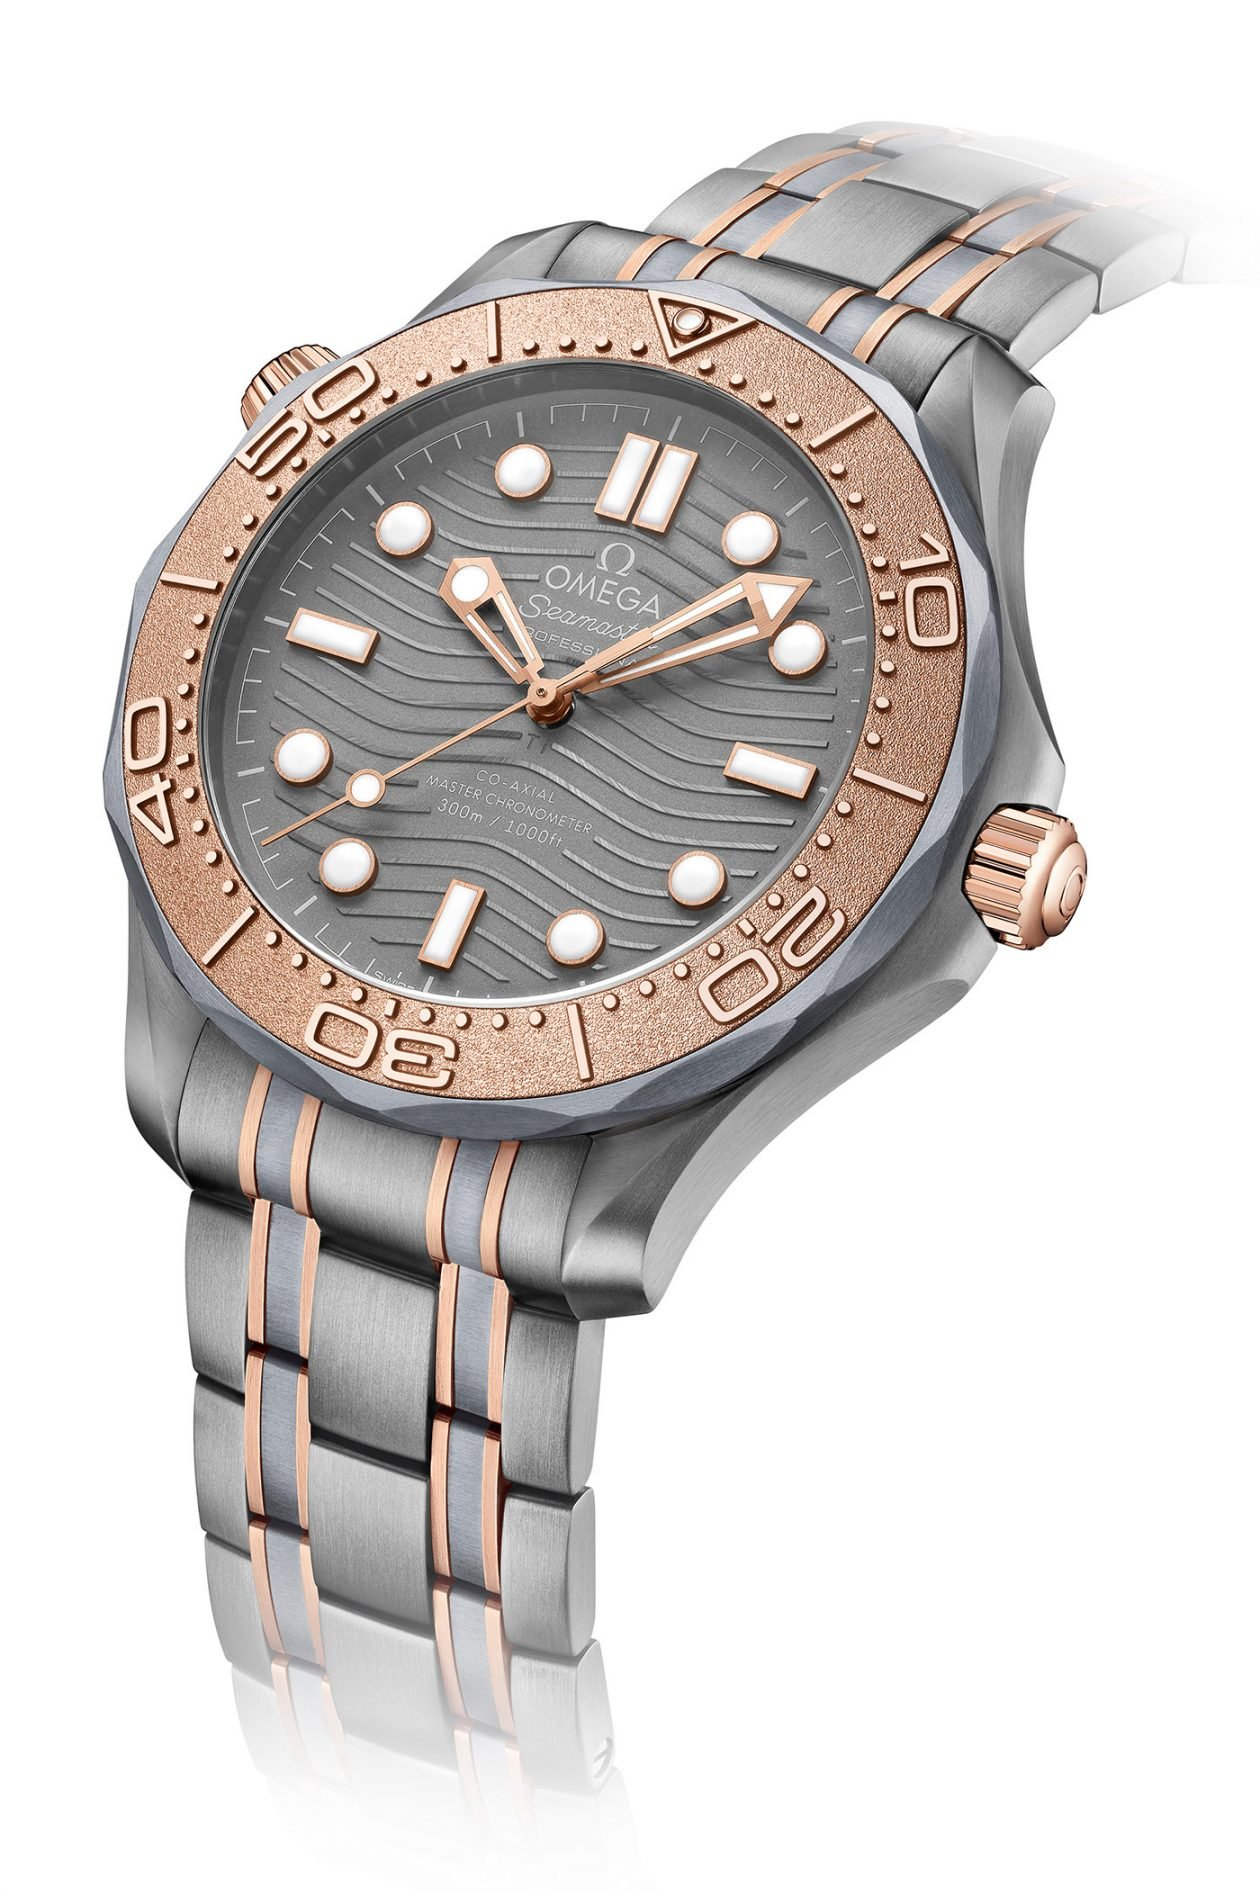 Omega Seamaster Diver 300M Titanium Tantalum Limited Edition